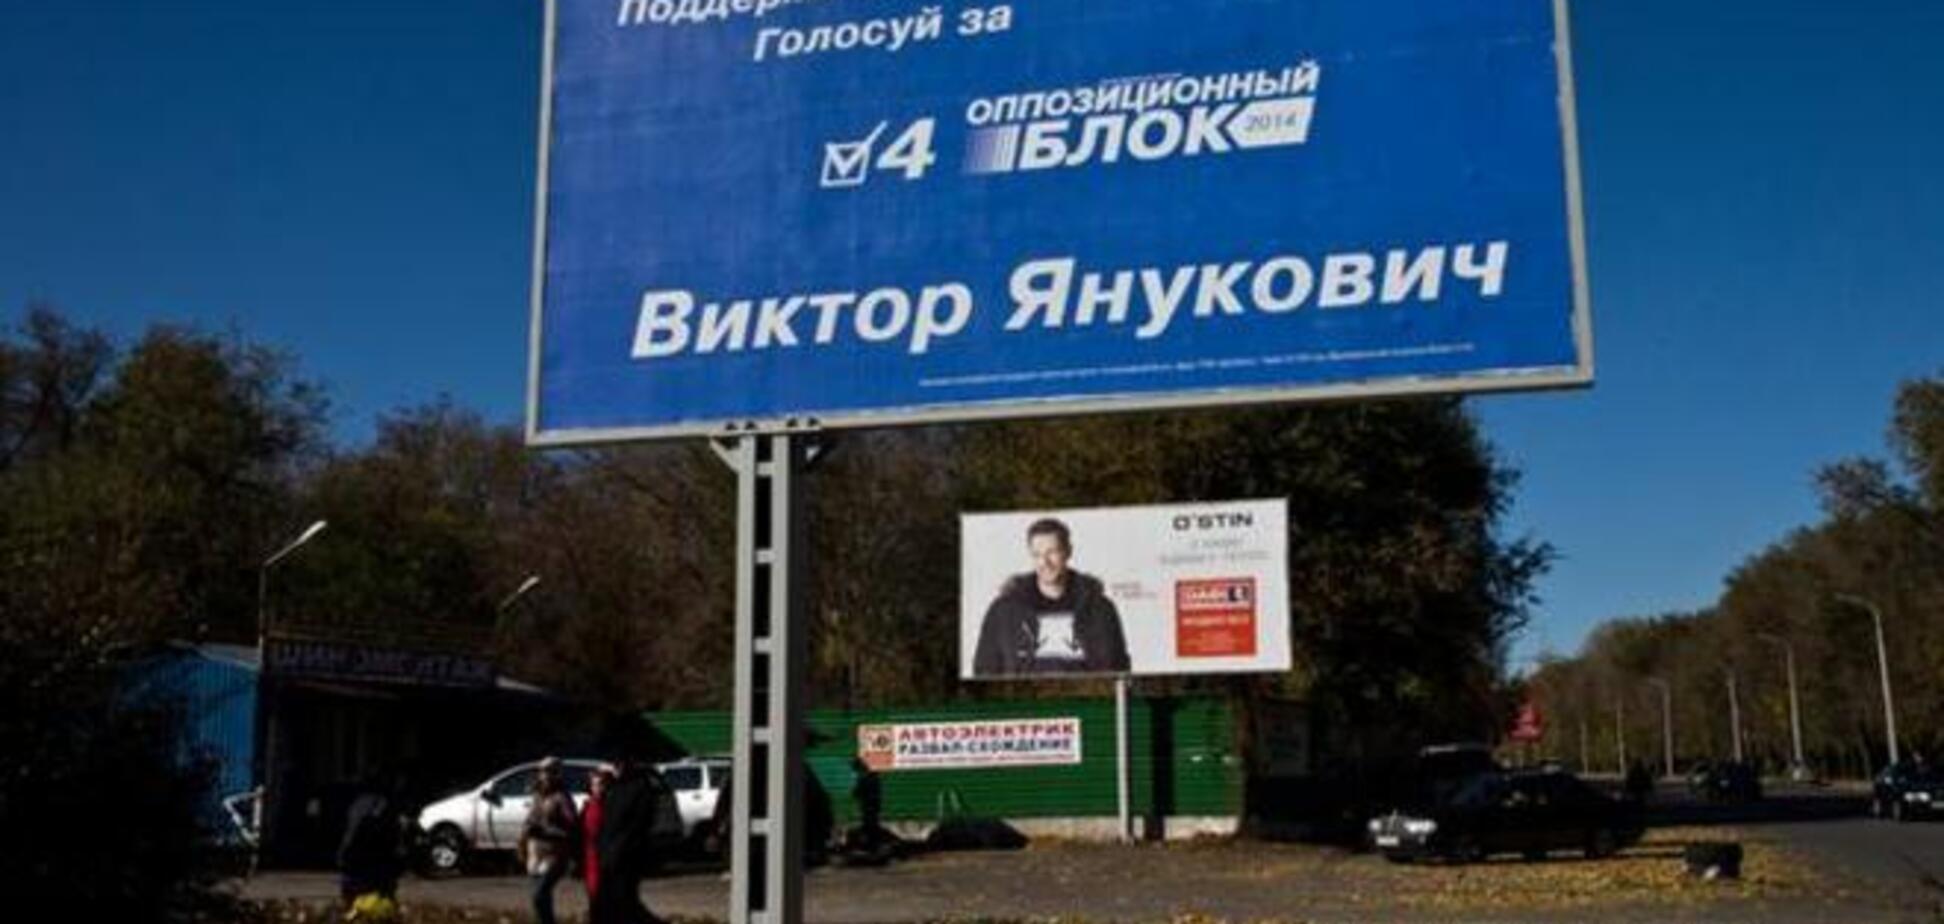 Опубликовано фото агитации за Януковича в Мариуполе